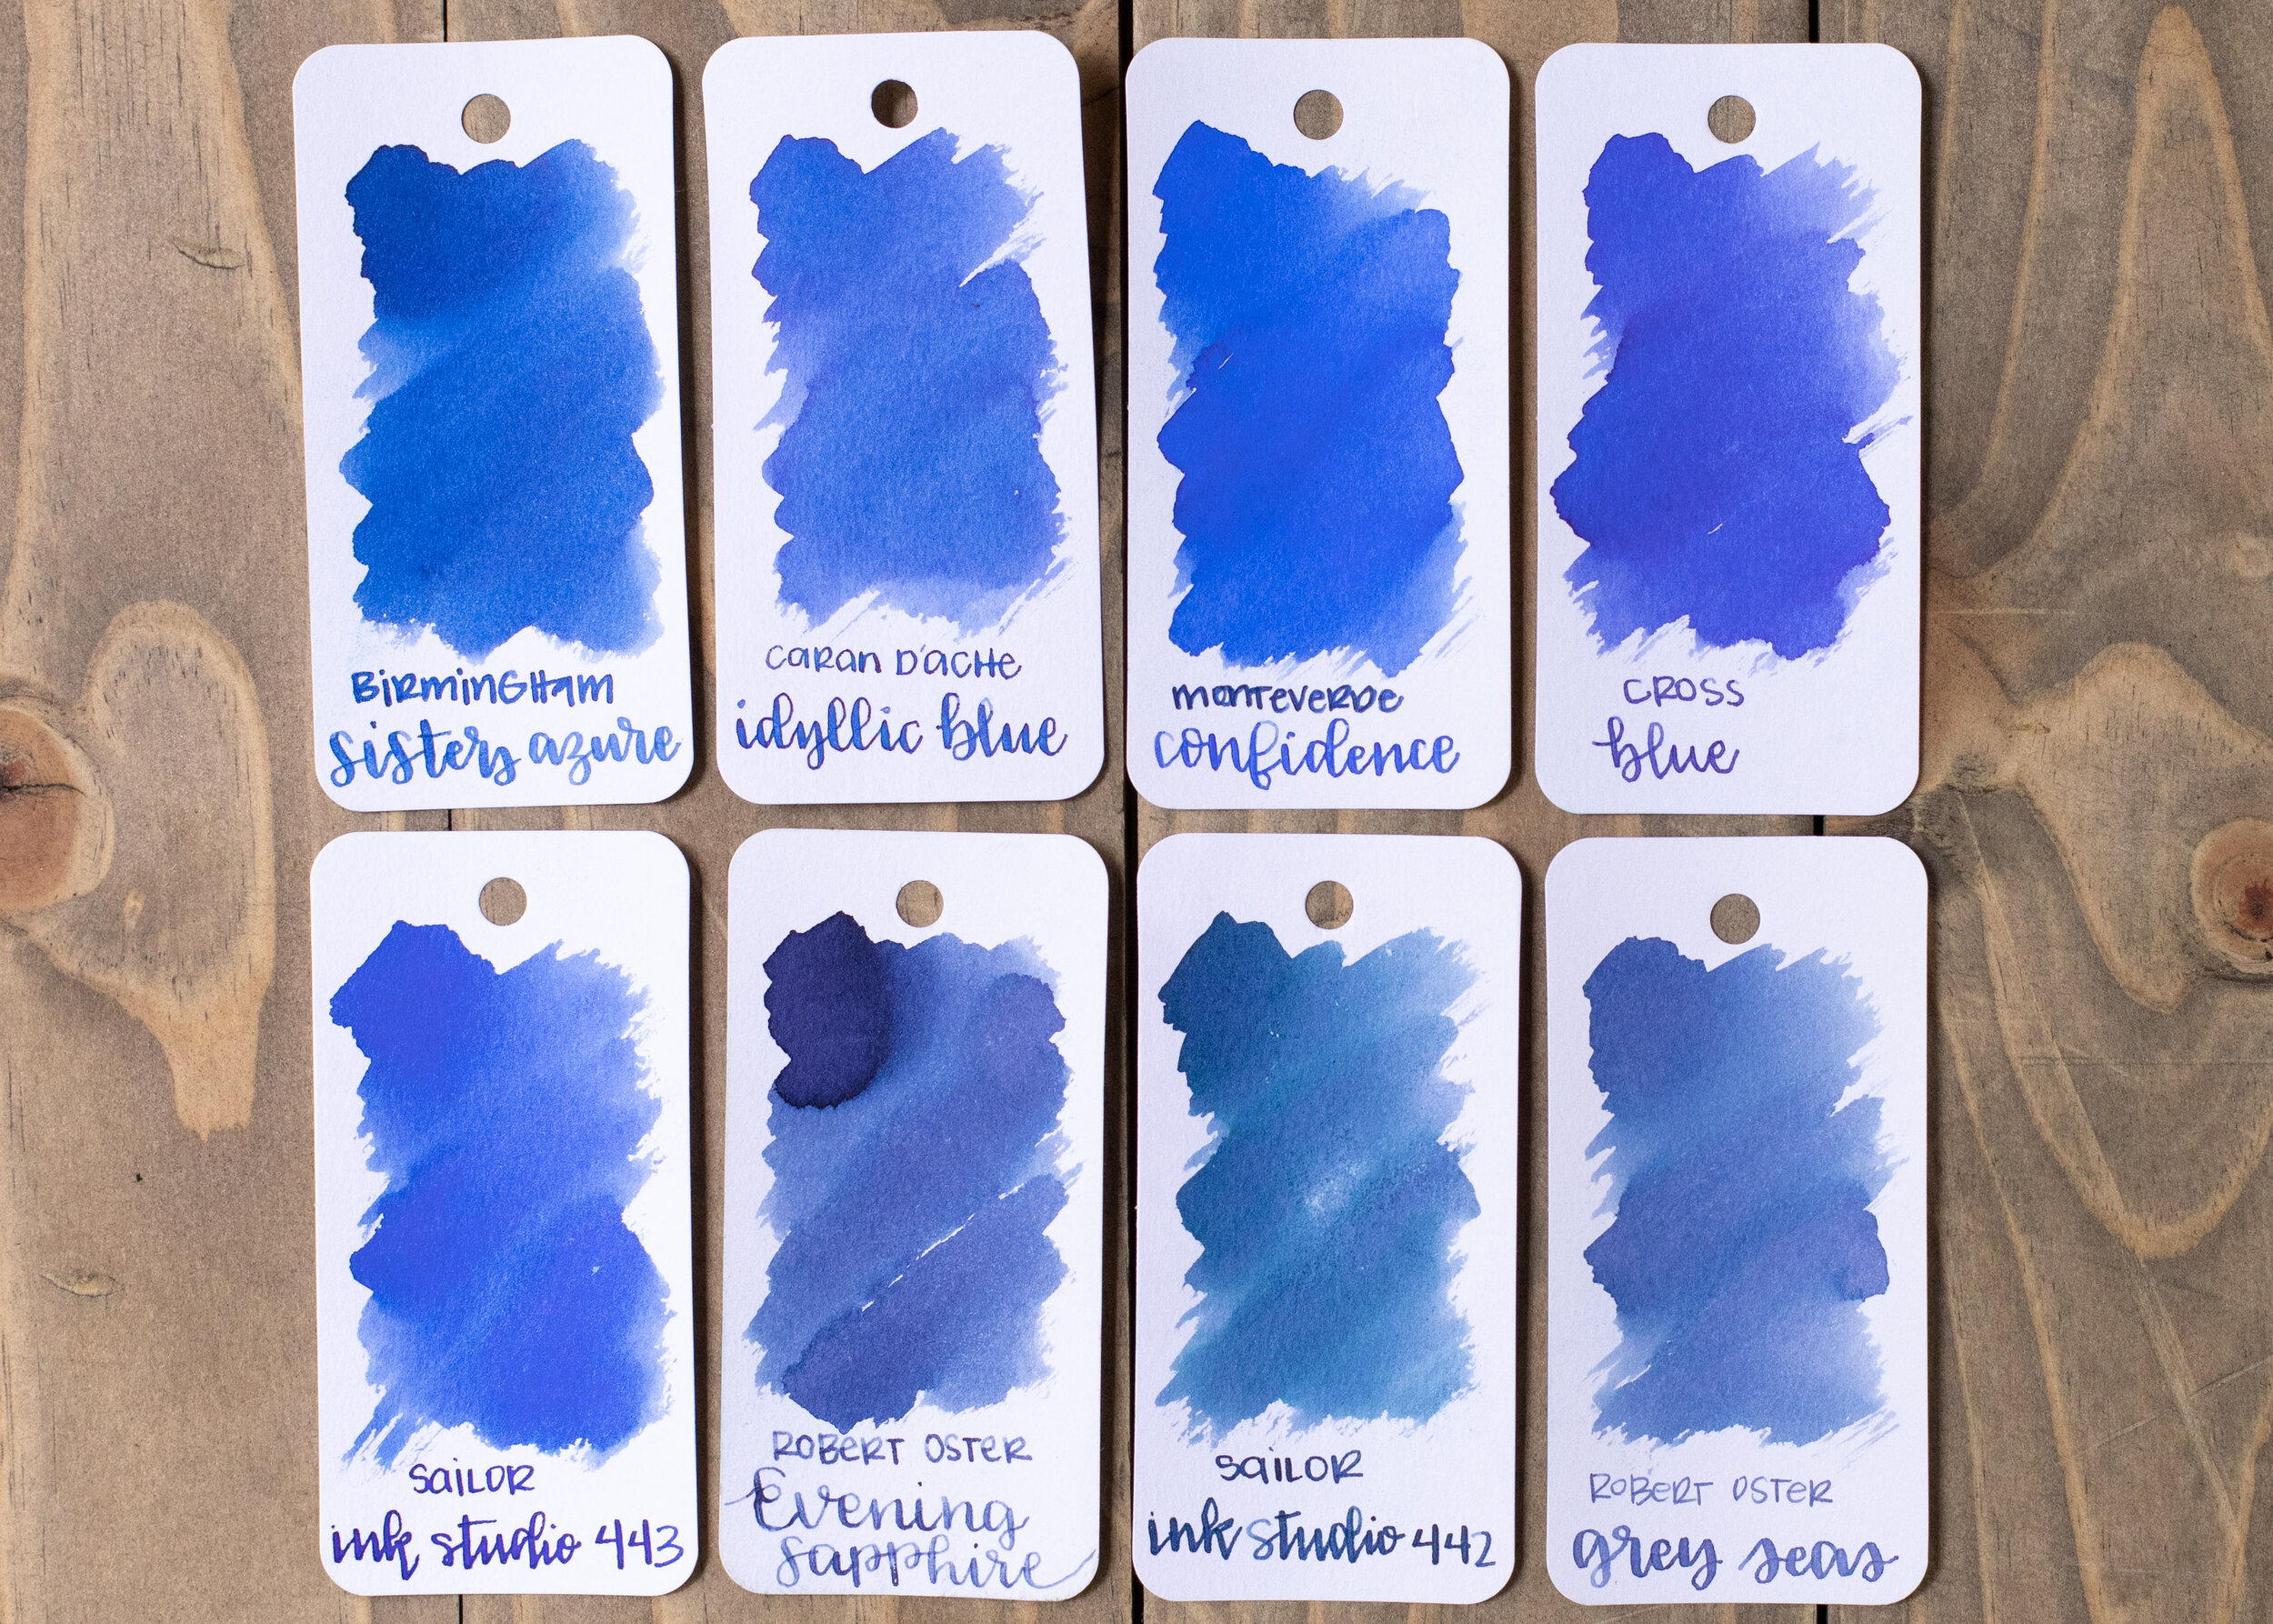 cda-idyllic-blue-s-3.jpg